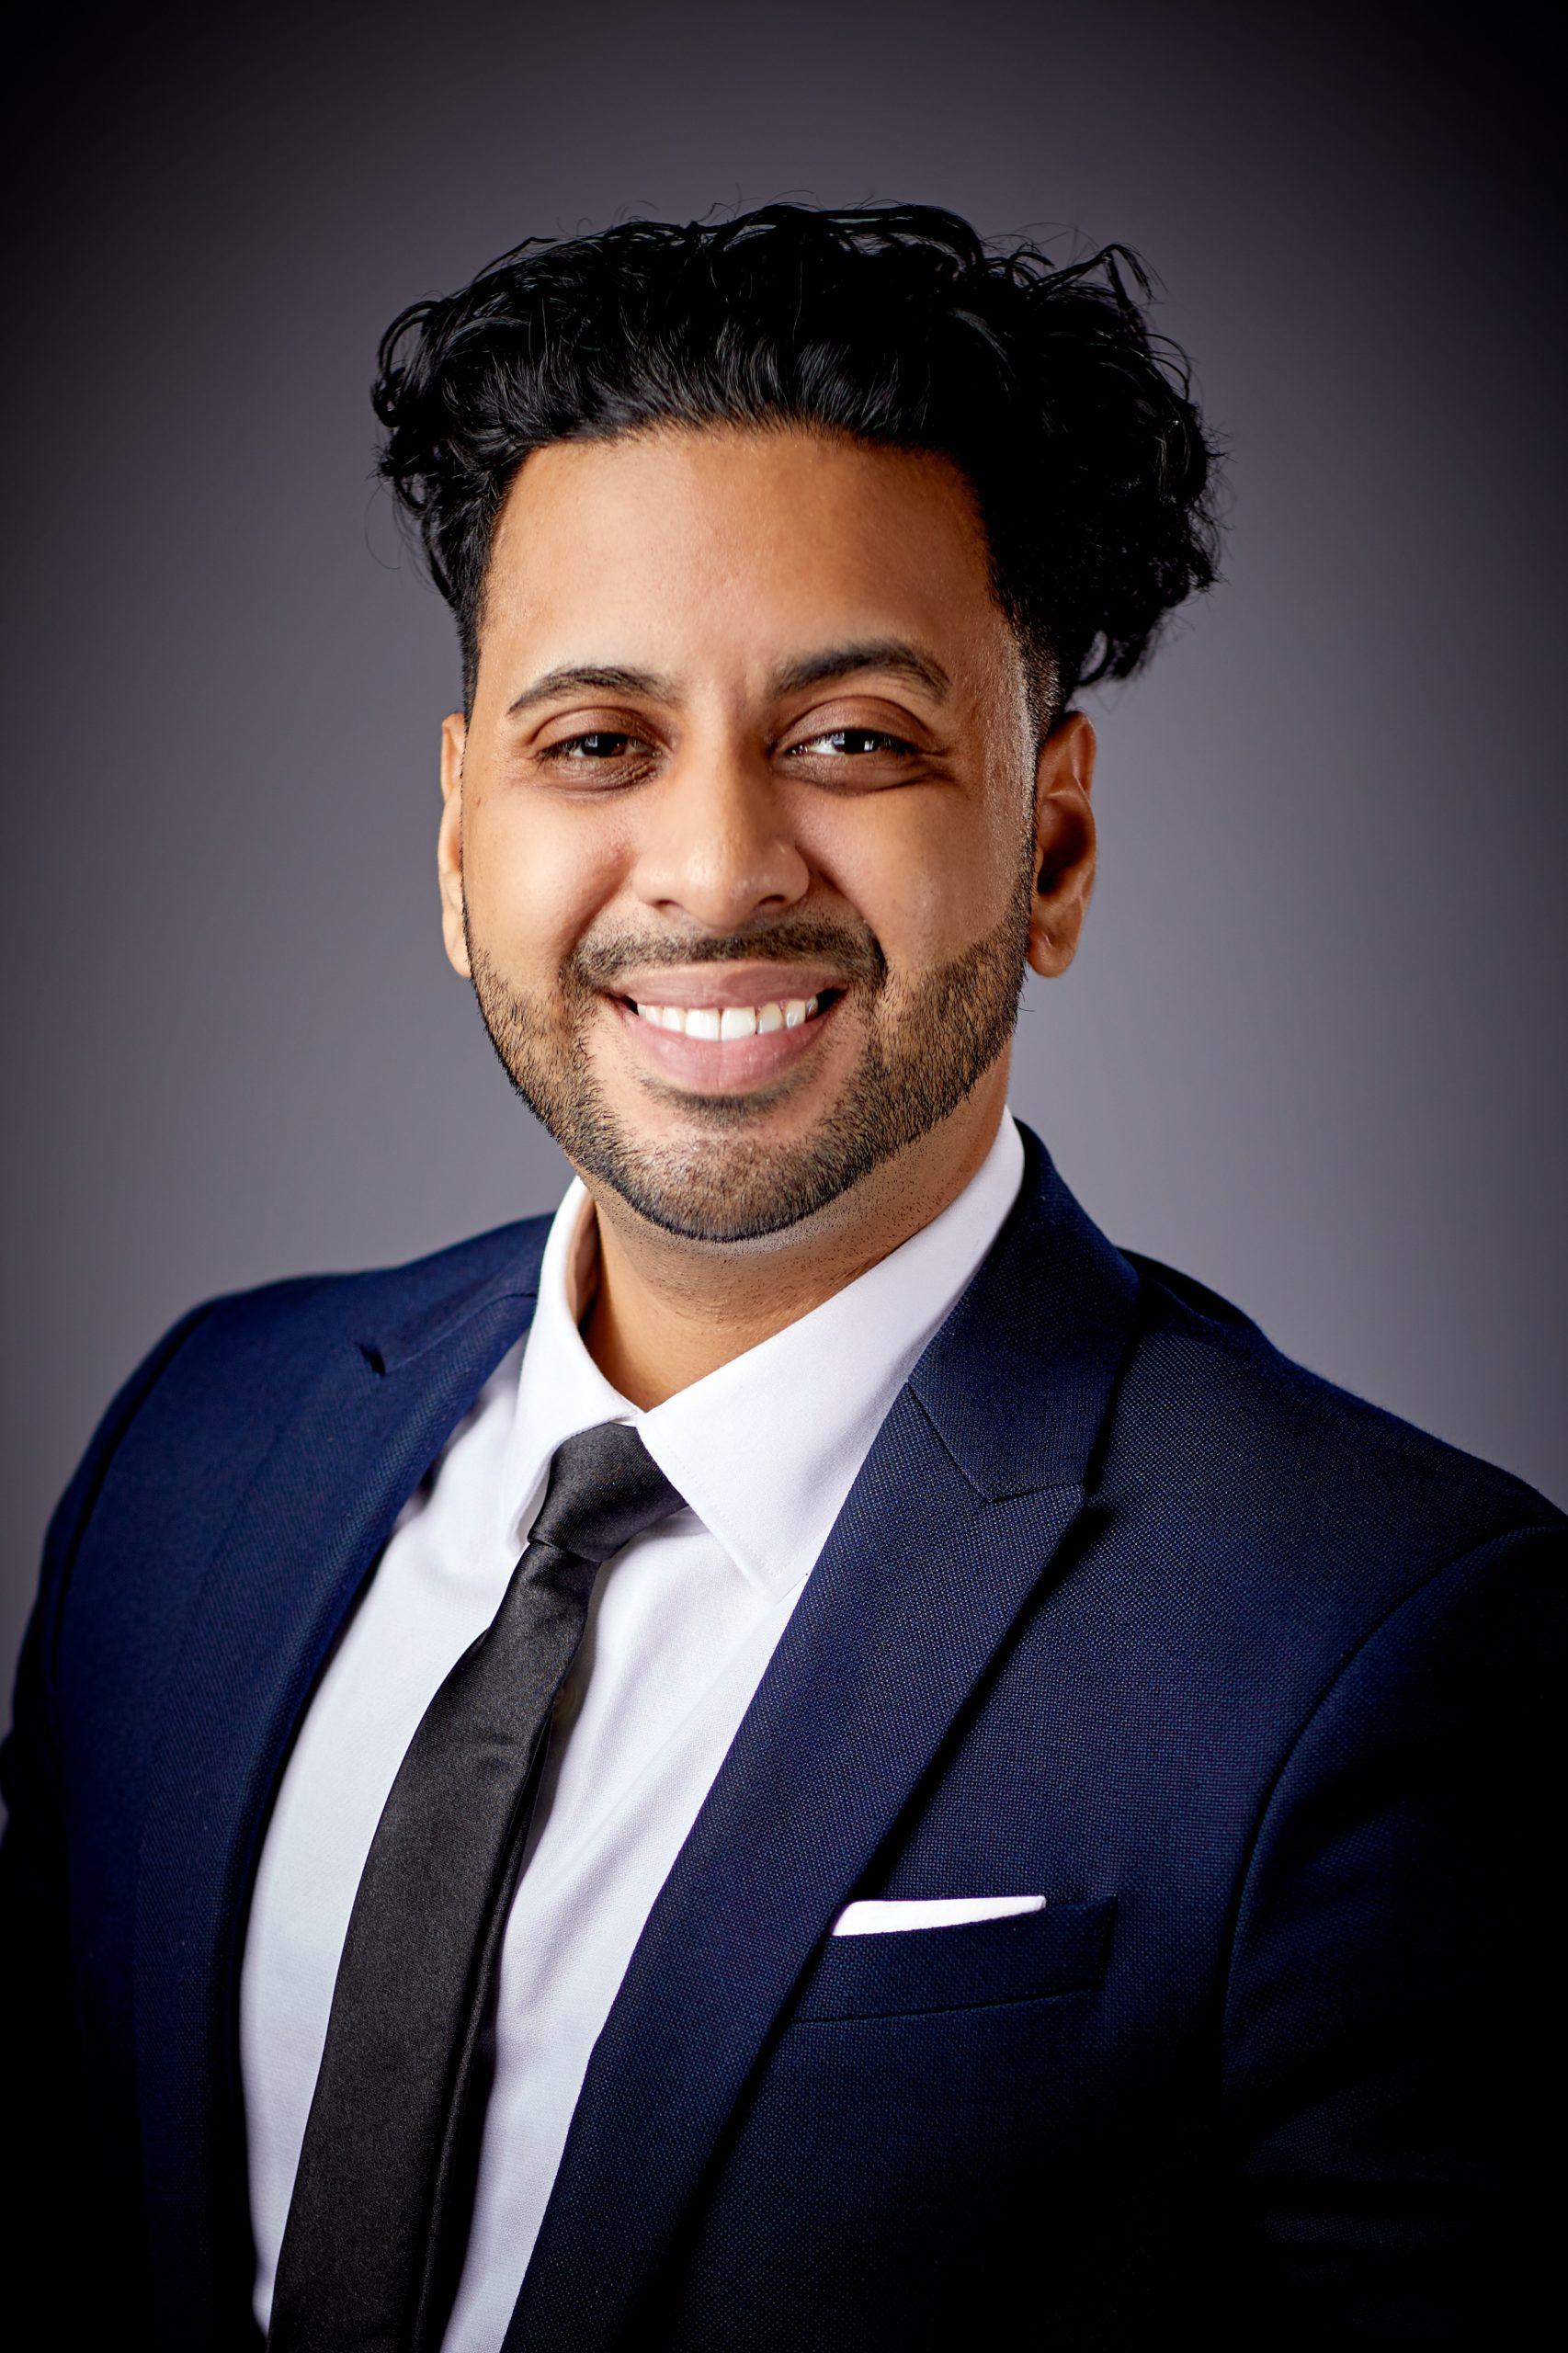 Paul Persaud